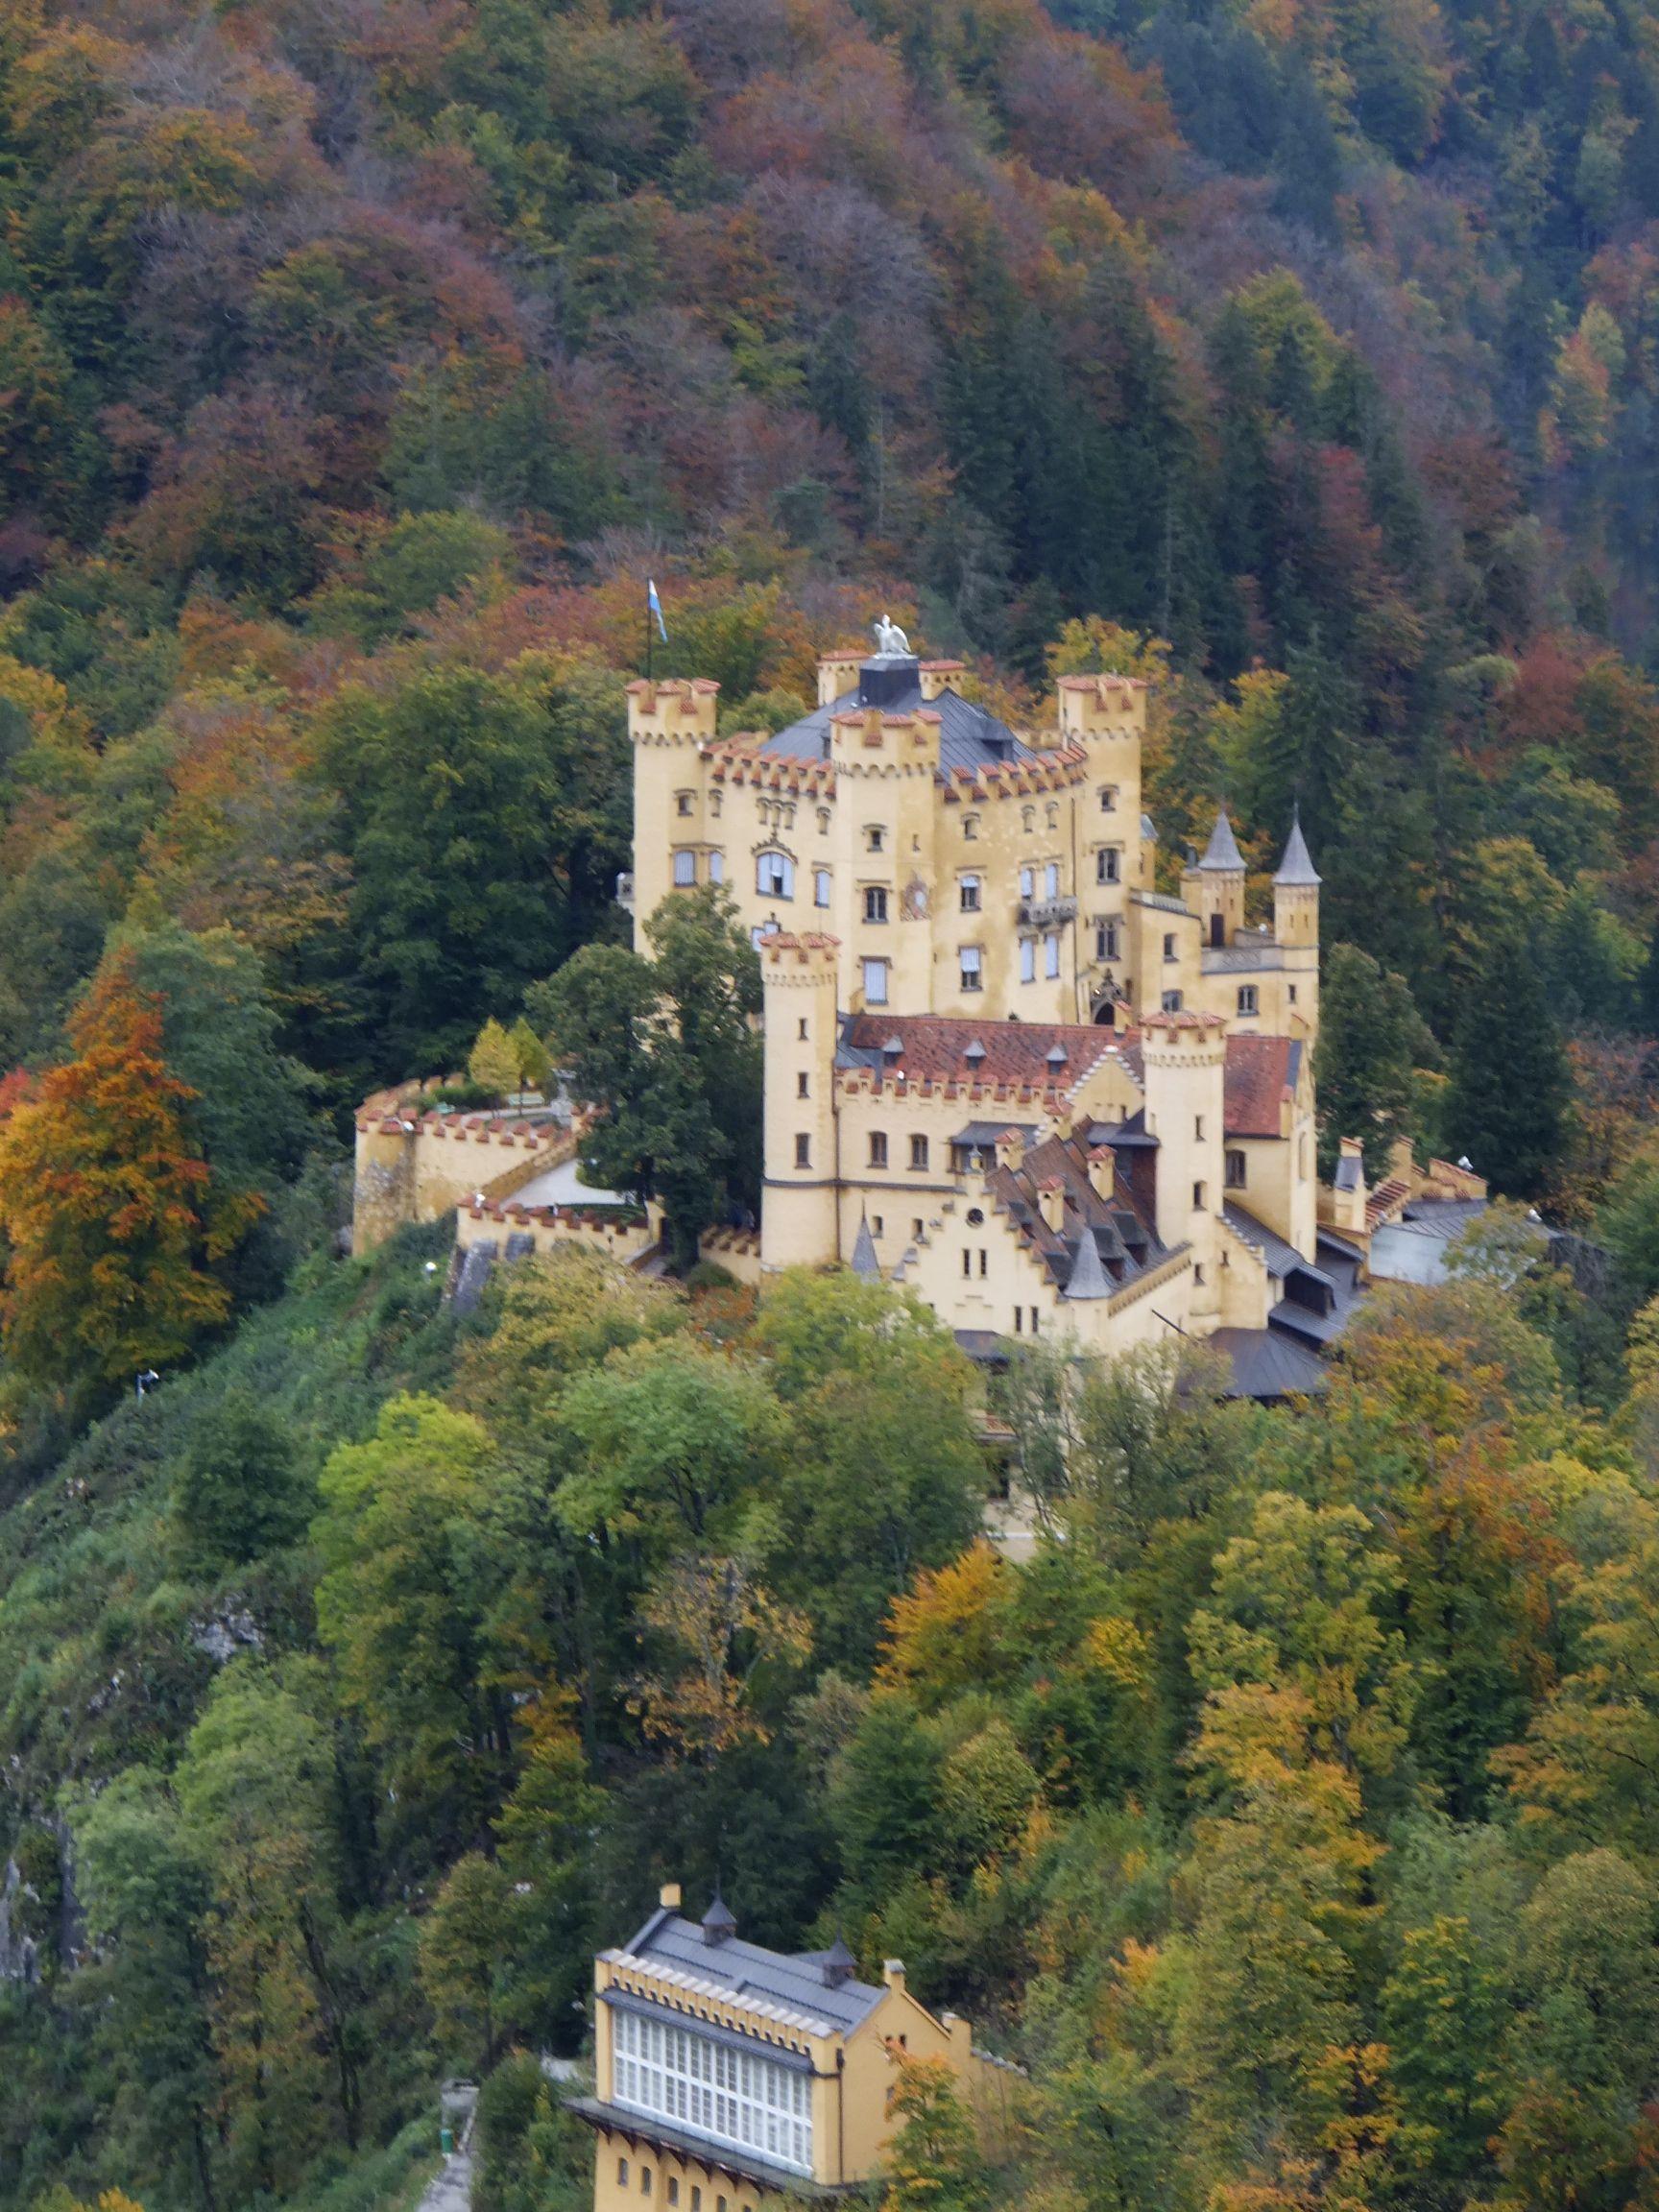 Schloss Hohenschwangau Bayern Germany Germany Castles Hohenzollern Castle Famous Castles